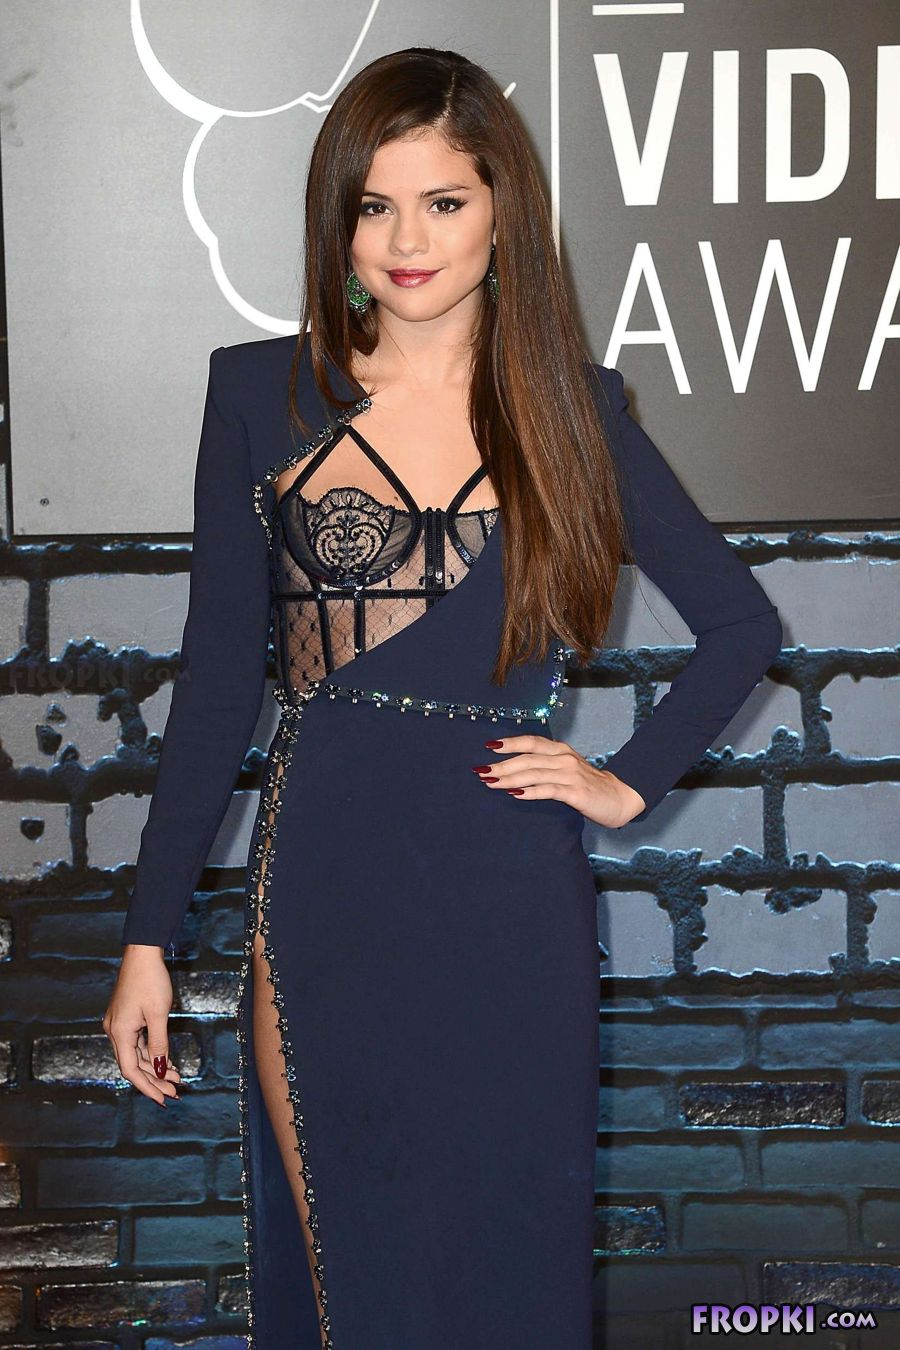 Selena Gomez - 2013 MTV Video Music Awards in NY AbpQothZ